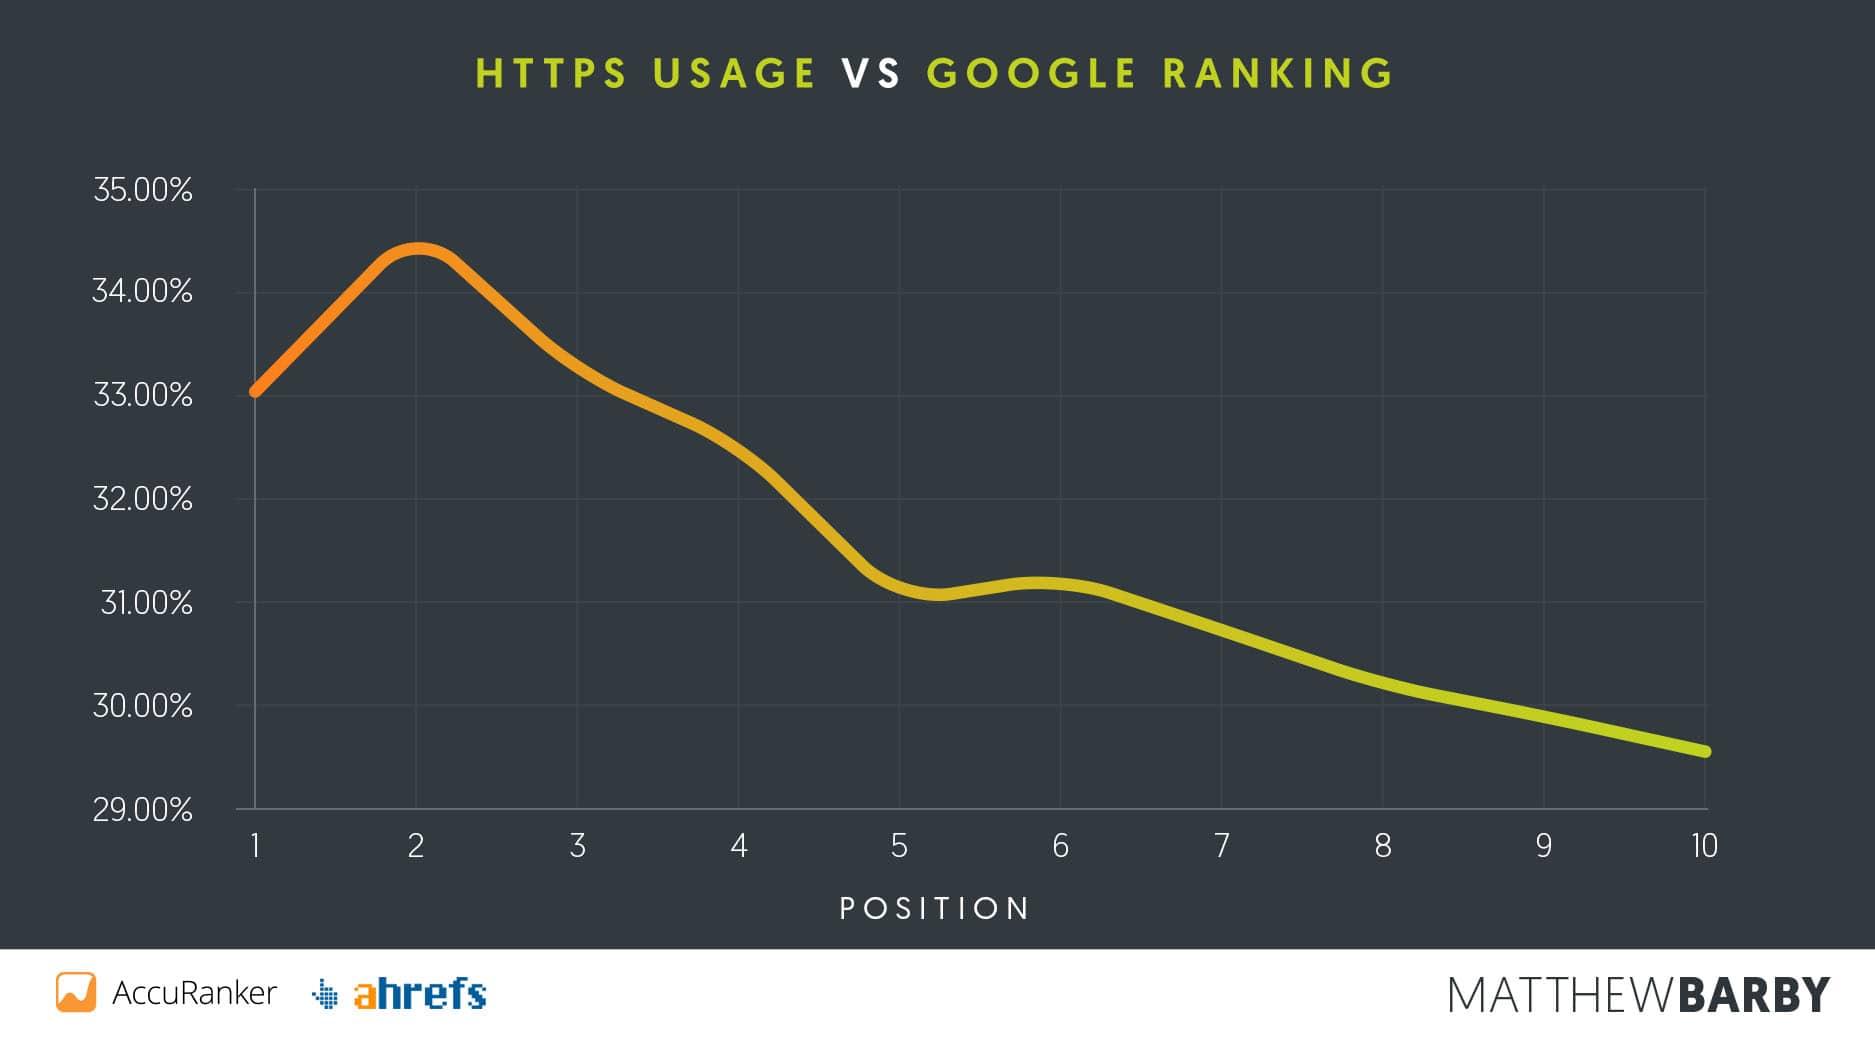 uso de https vs ranking de google